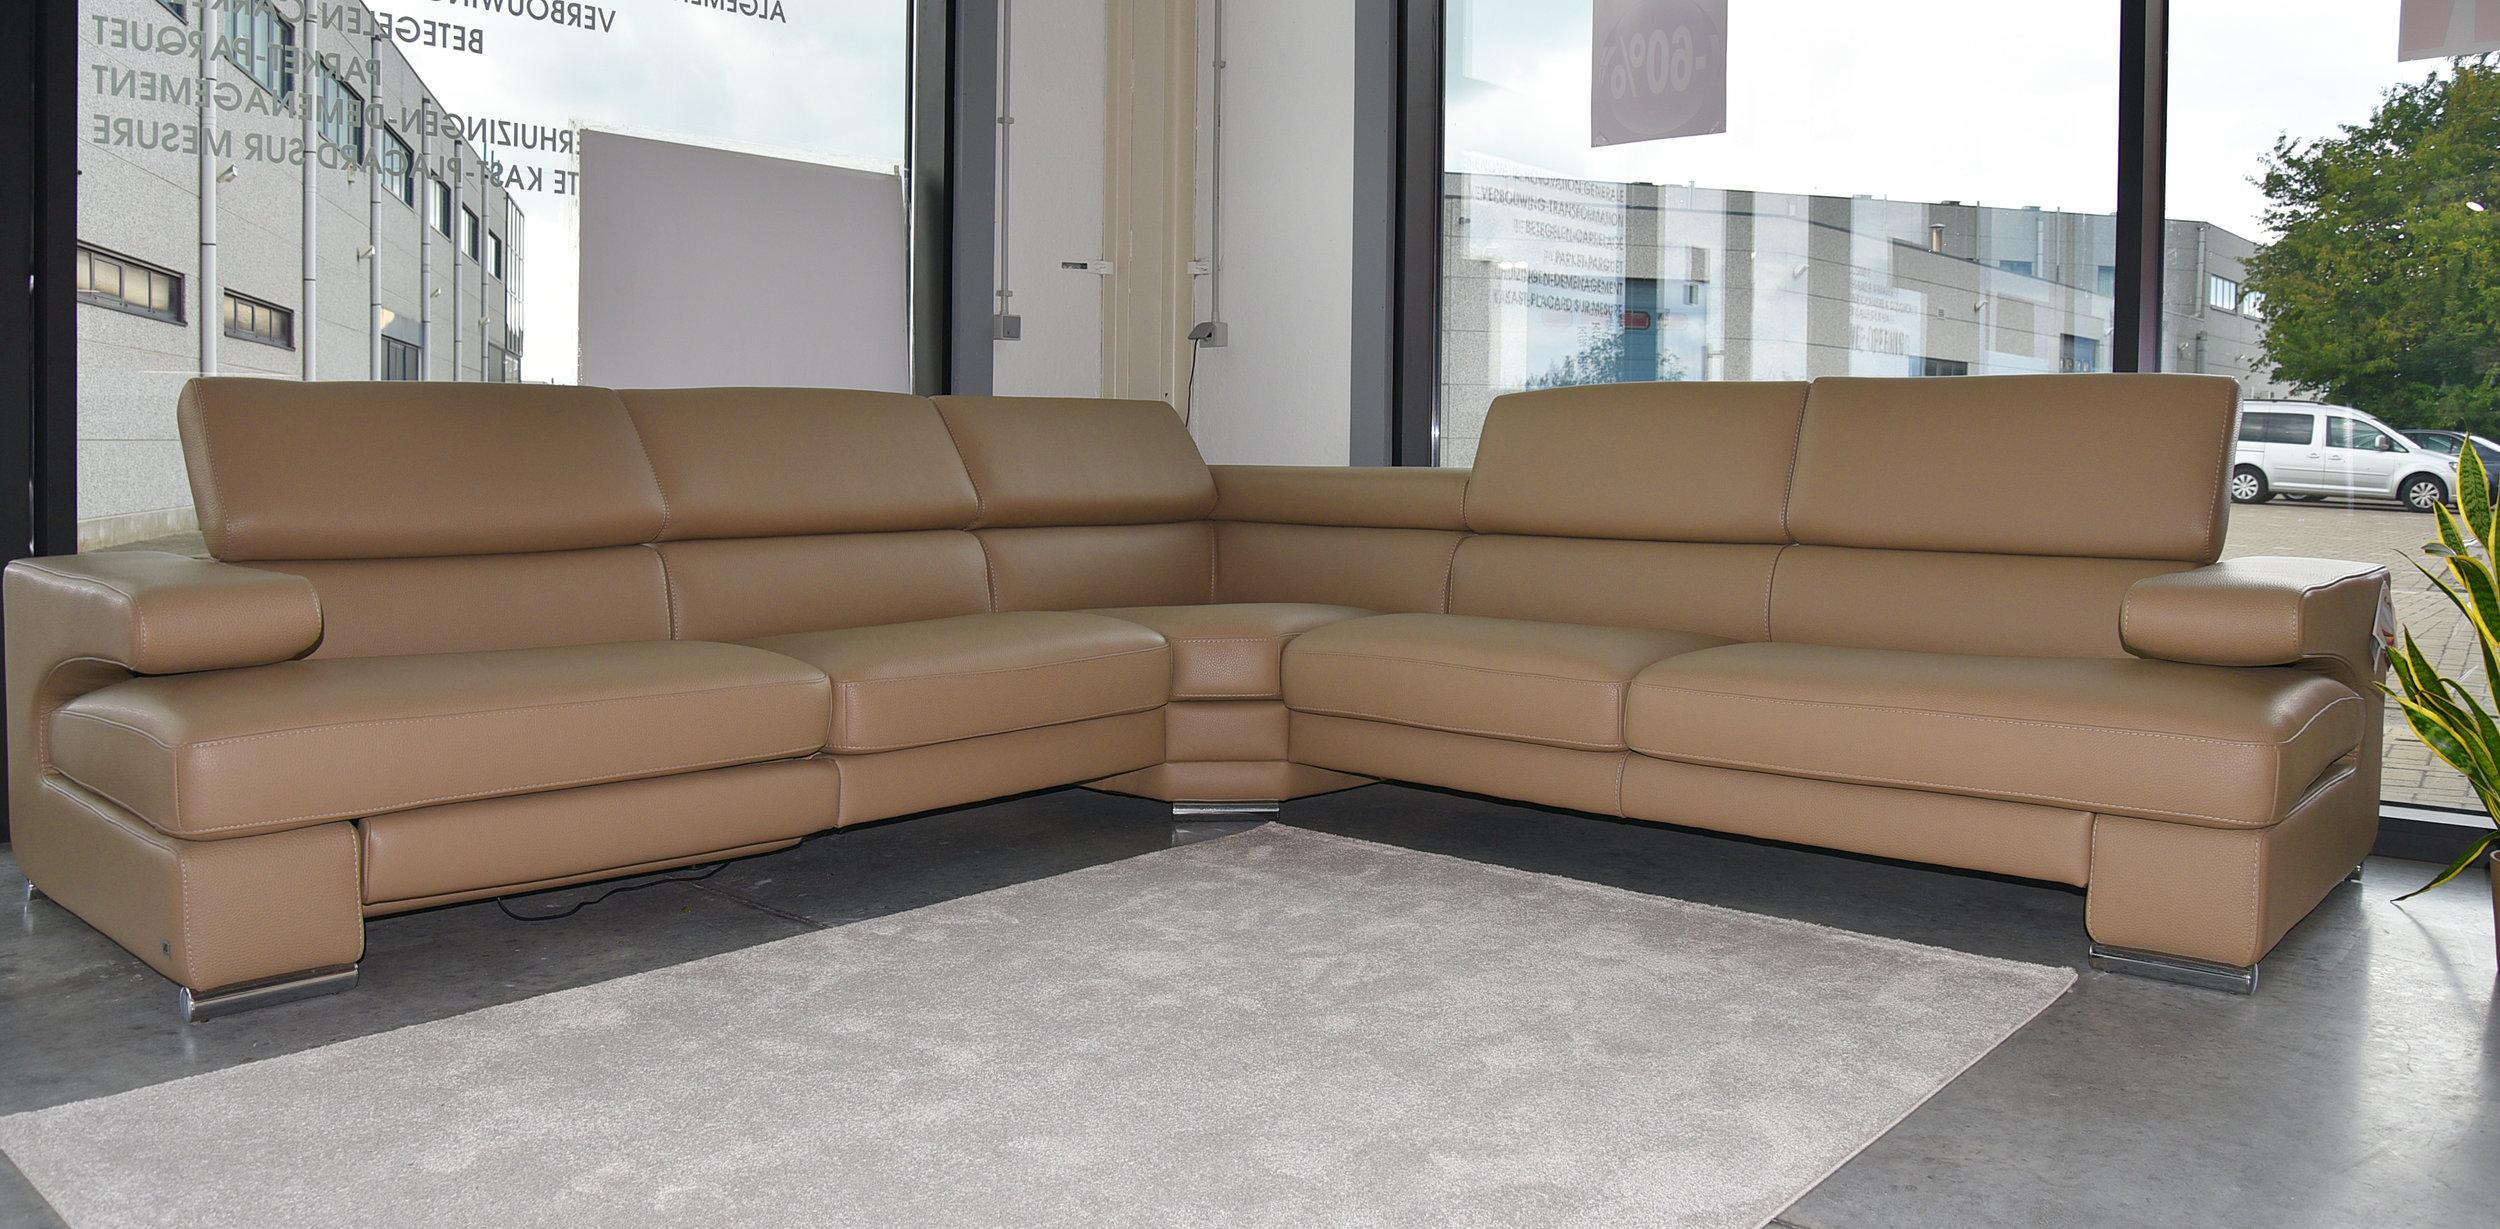 divano - 01.jpg